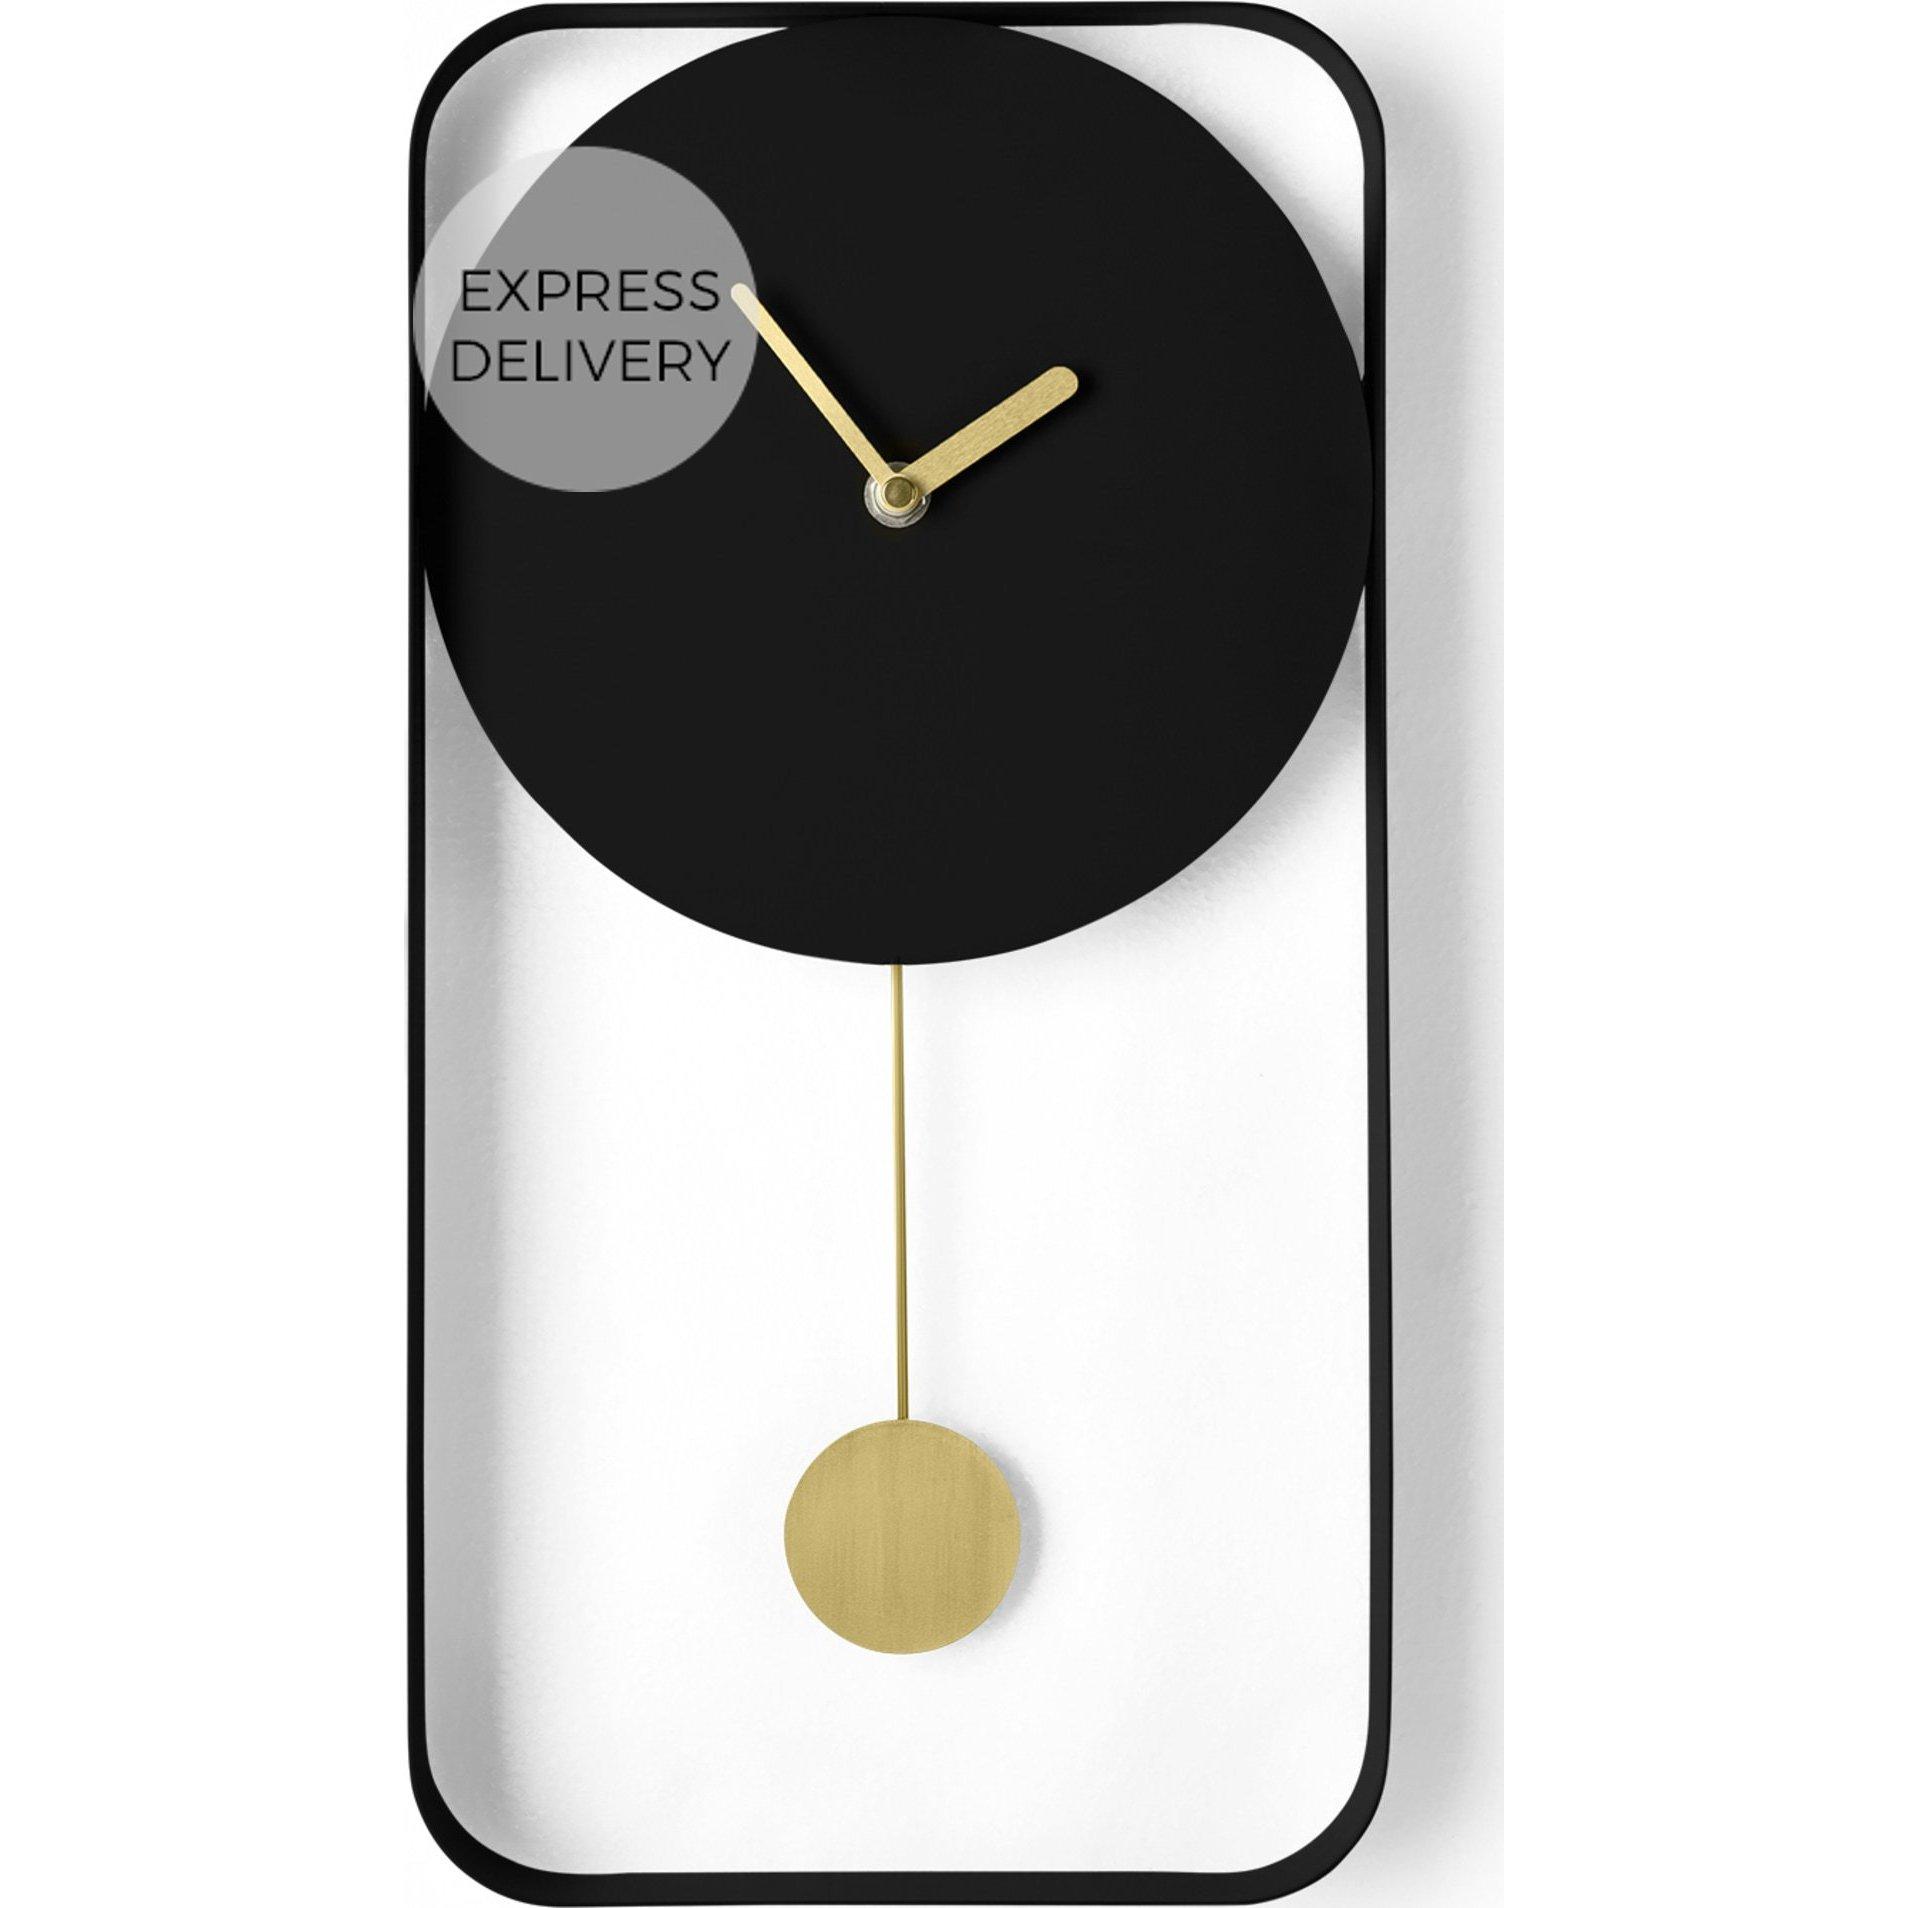 image-Bard Pendulum Wall Clock, Matt Black & Brass